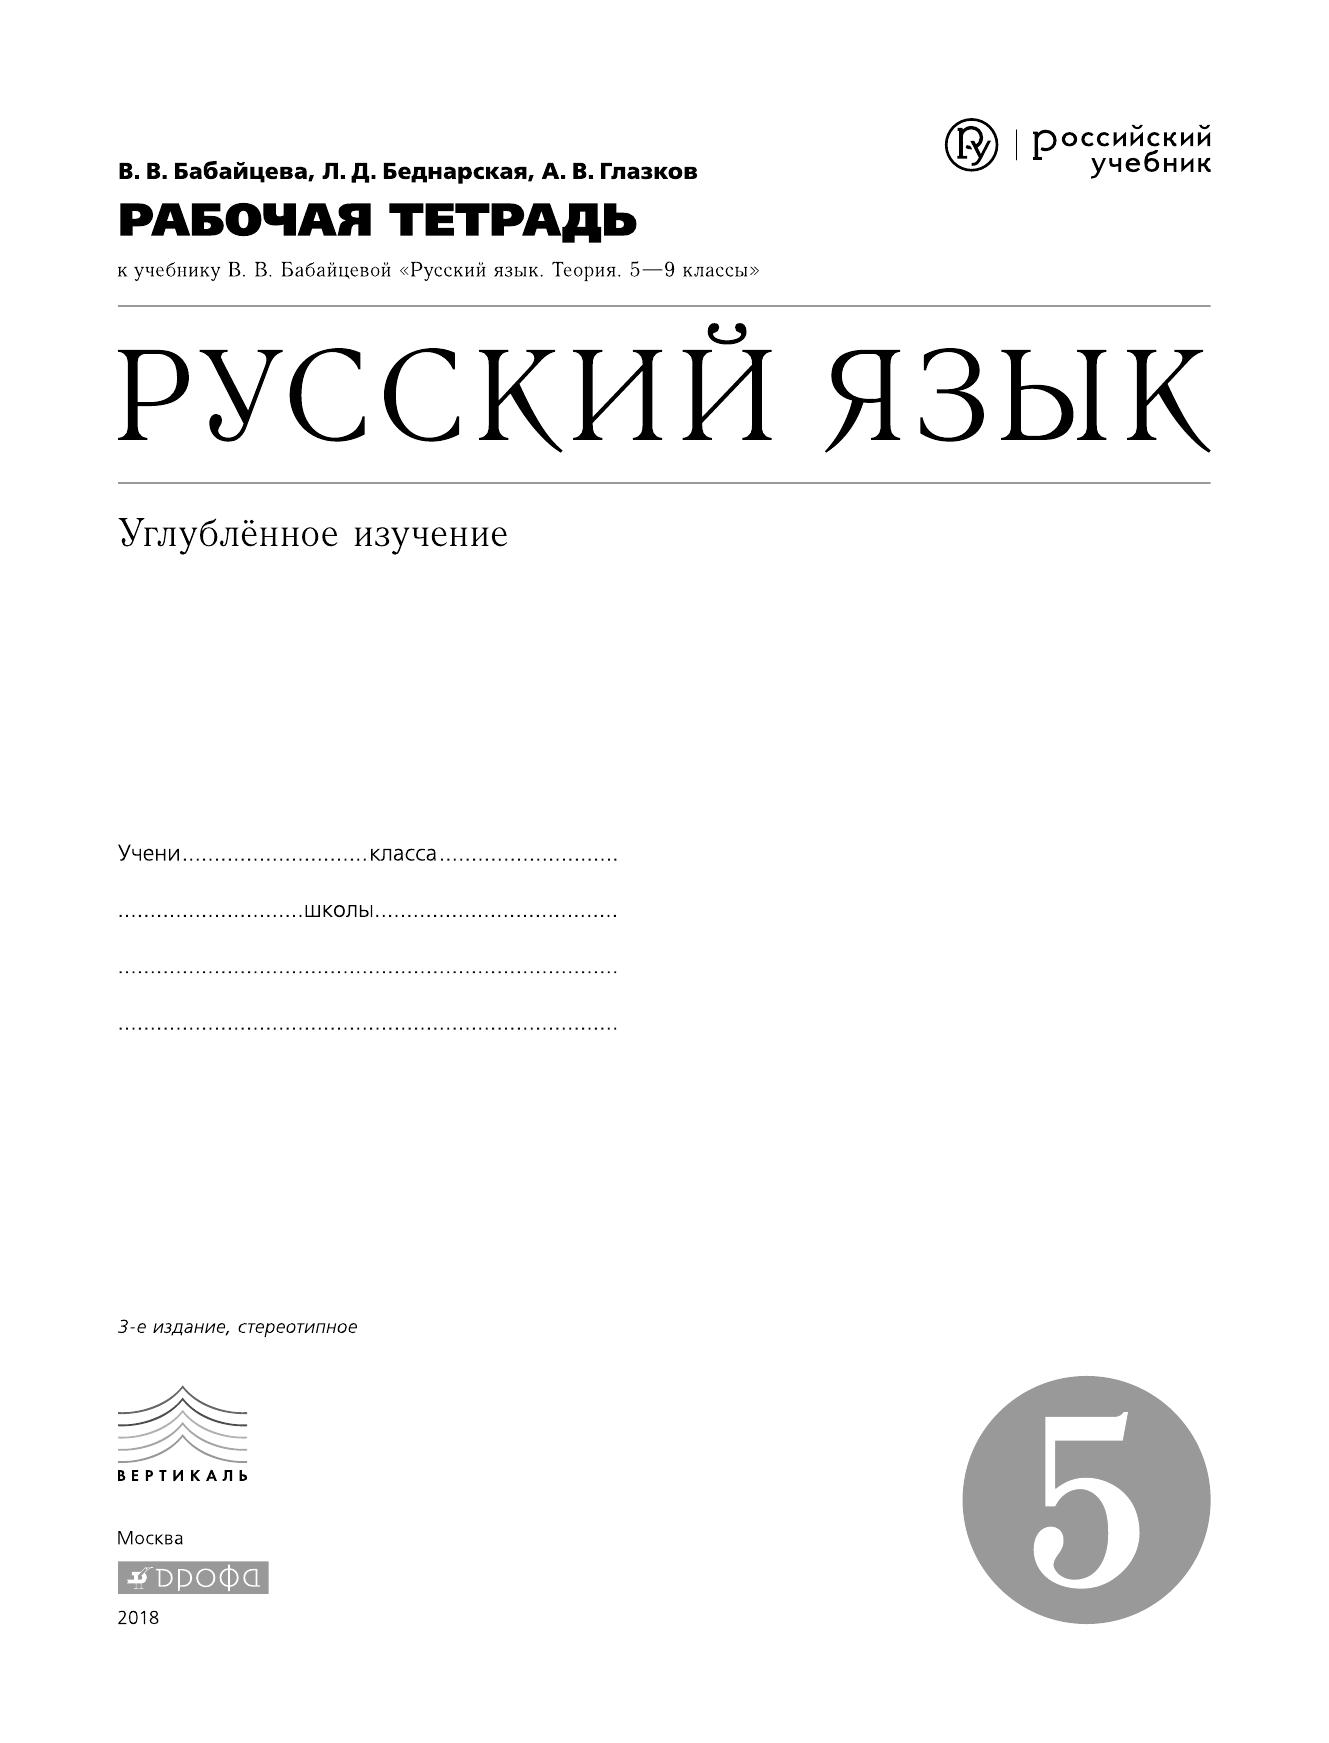 Решебник Русский Язык Рабочая Тетрадь Бабайцева 9